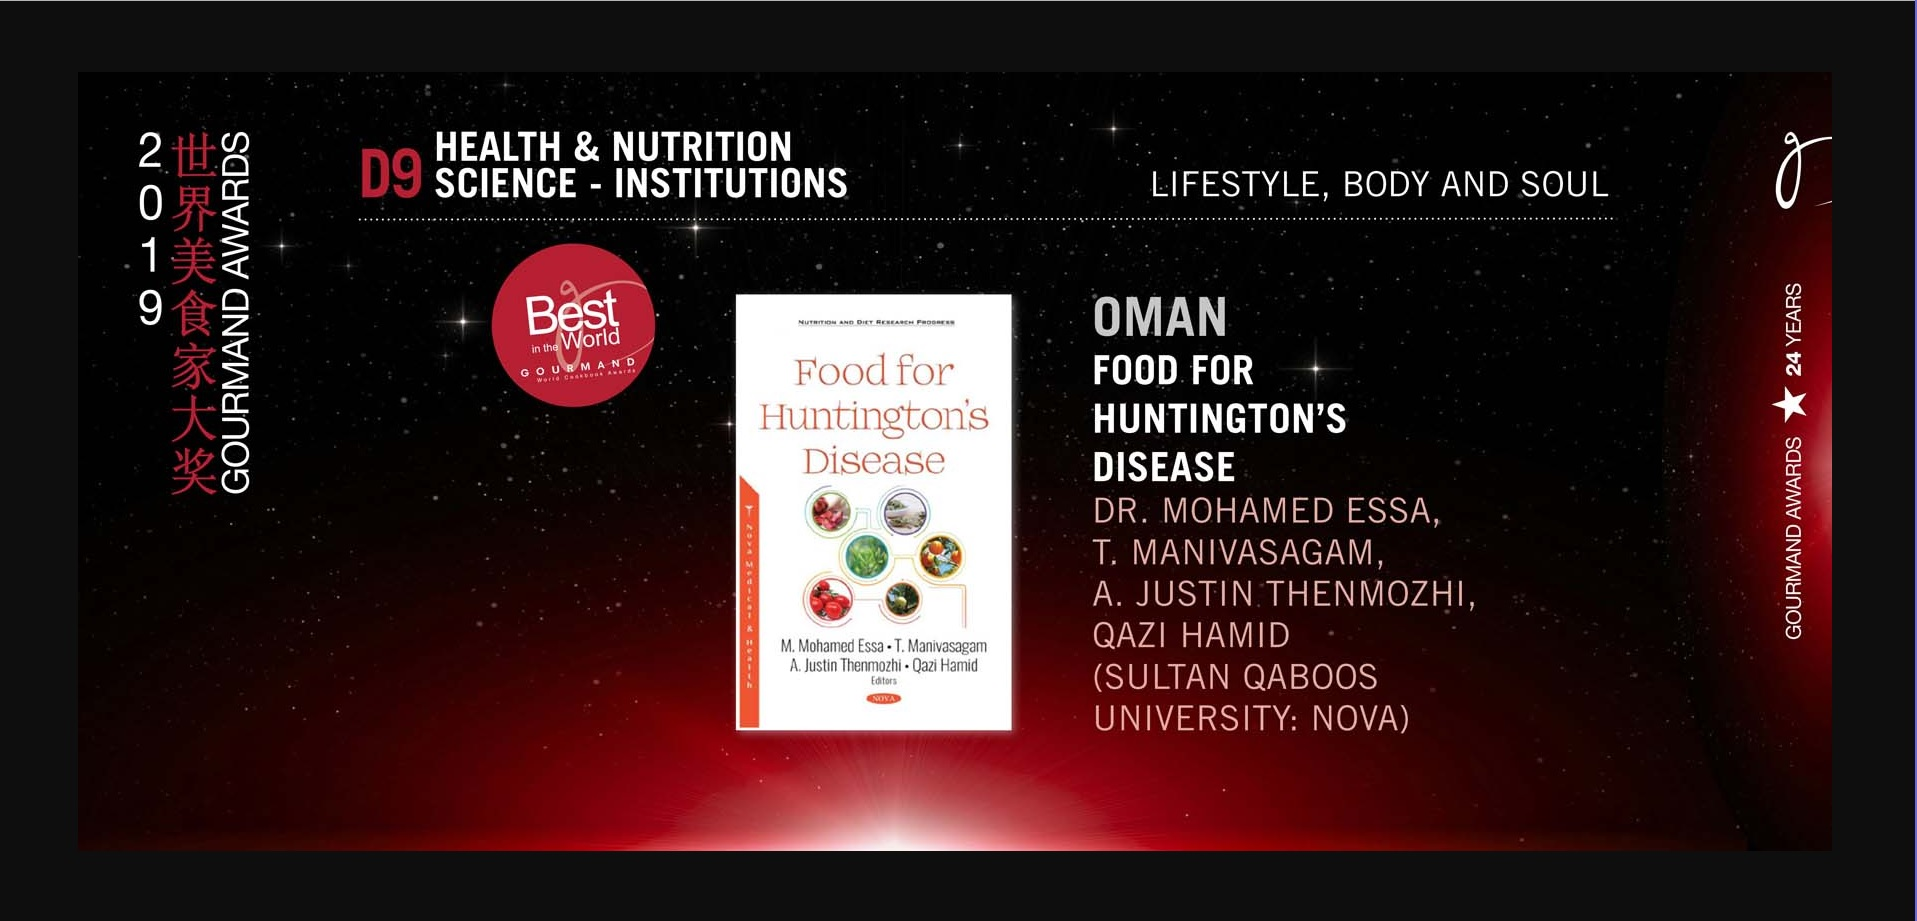 Book on Huntington's Disease wins global award